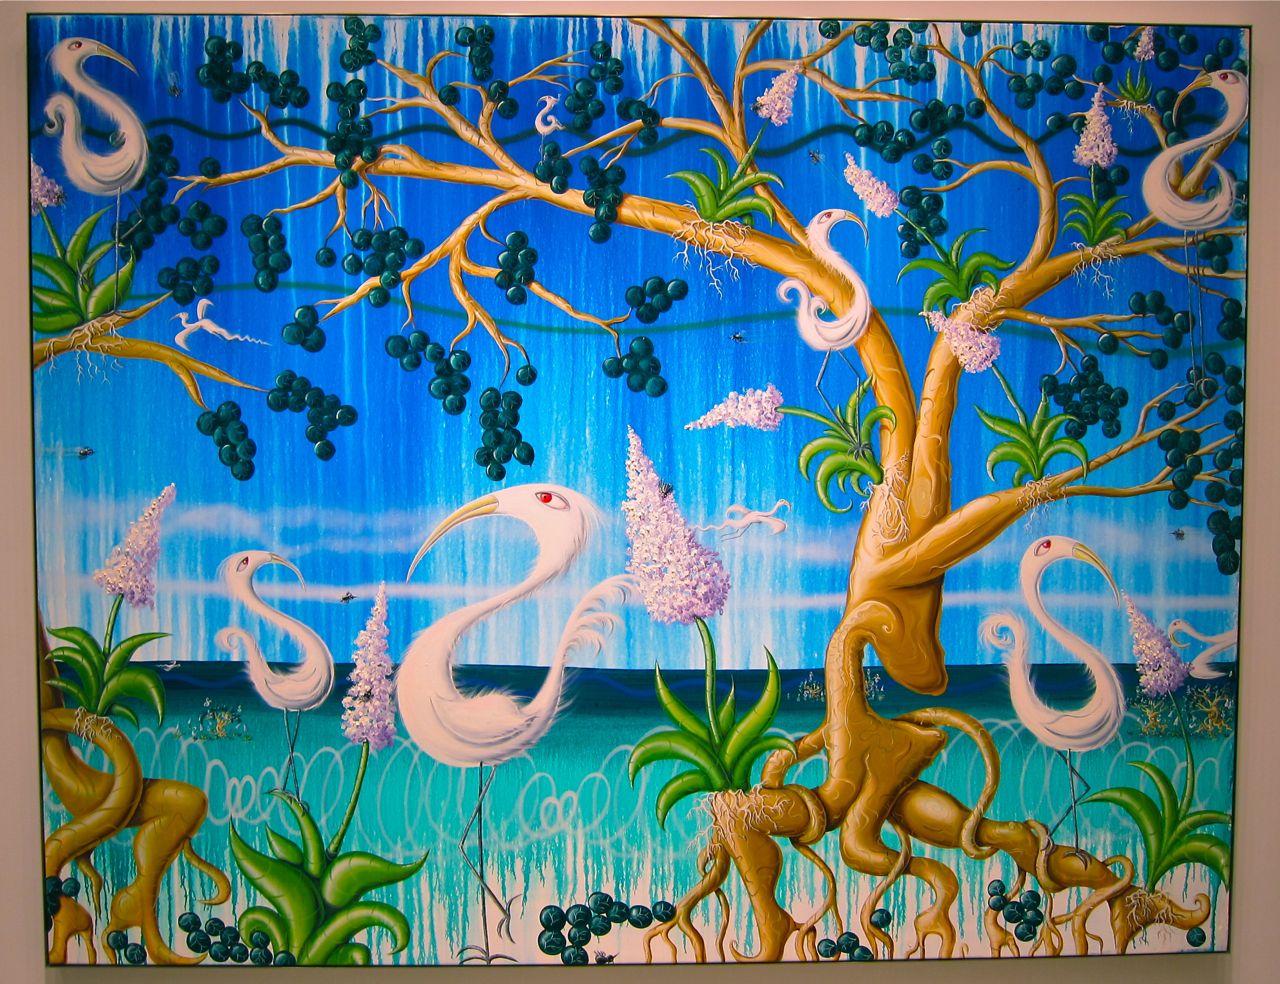 AM Kenny Scharf Naturafutura 20